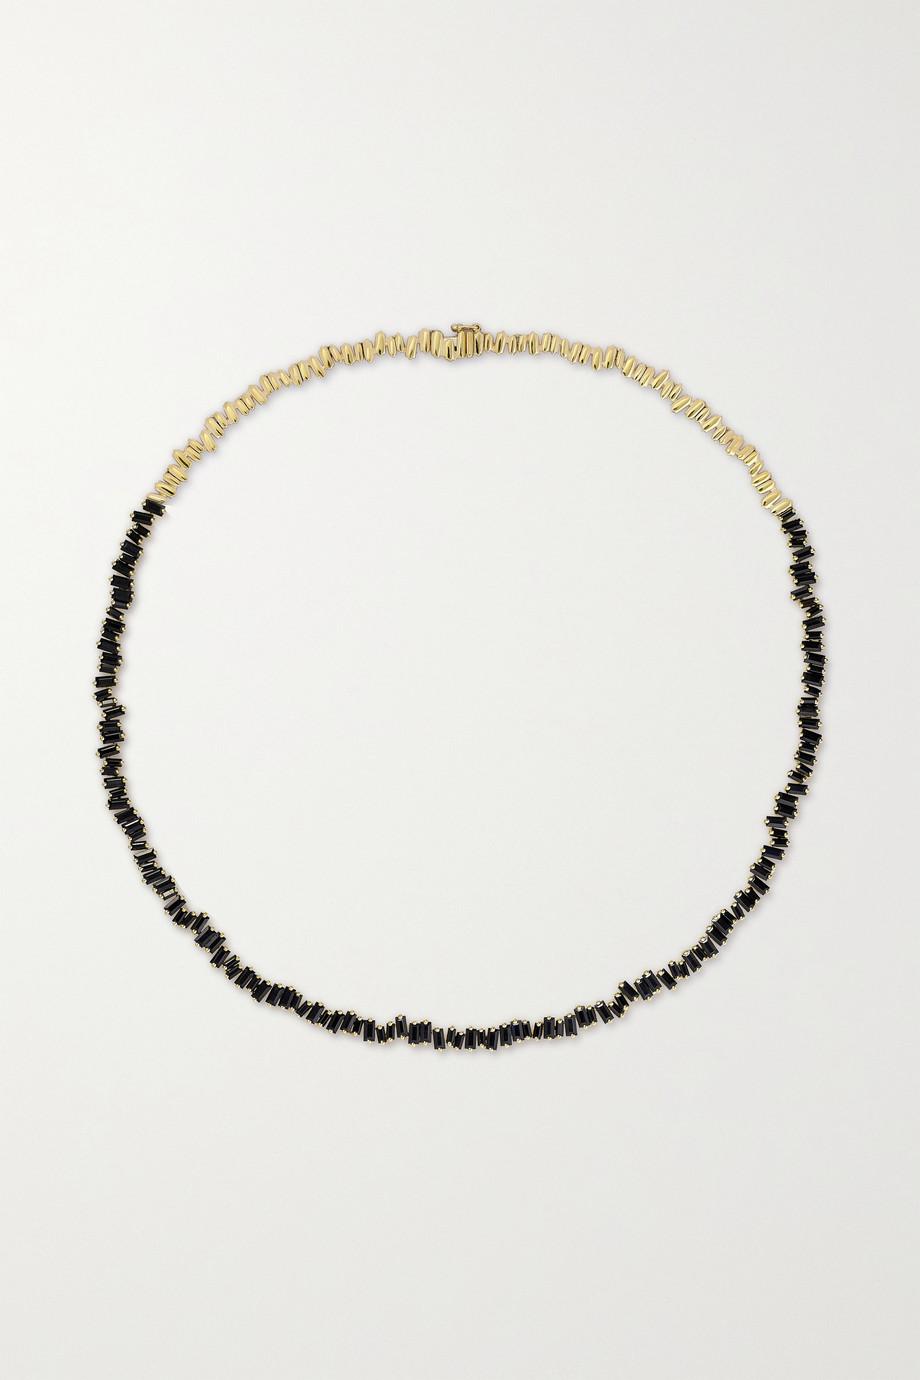 Suzanne Kalan 18-karat gold sapphire necklace